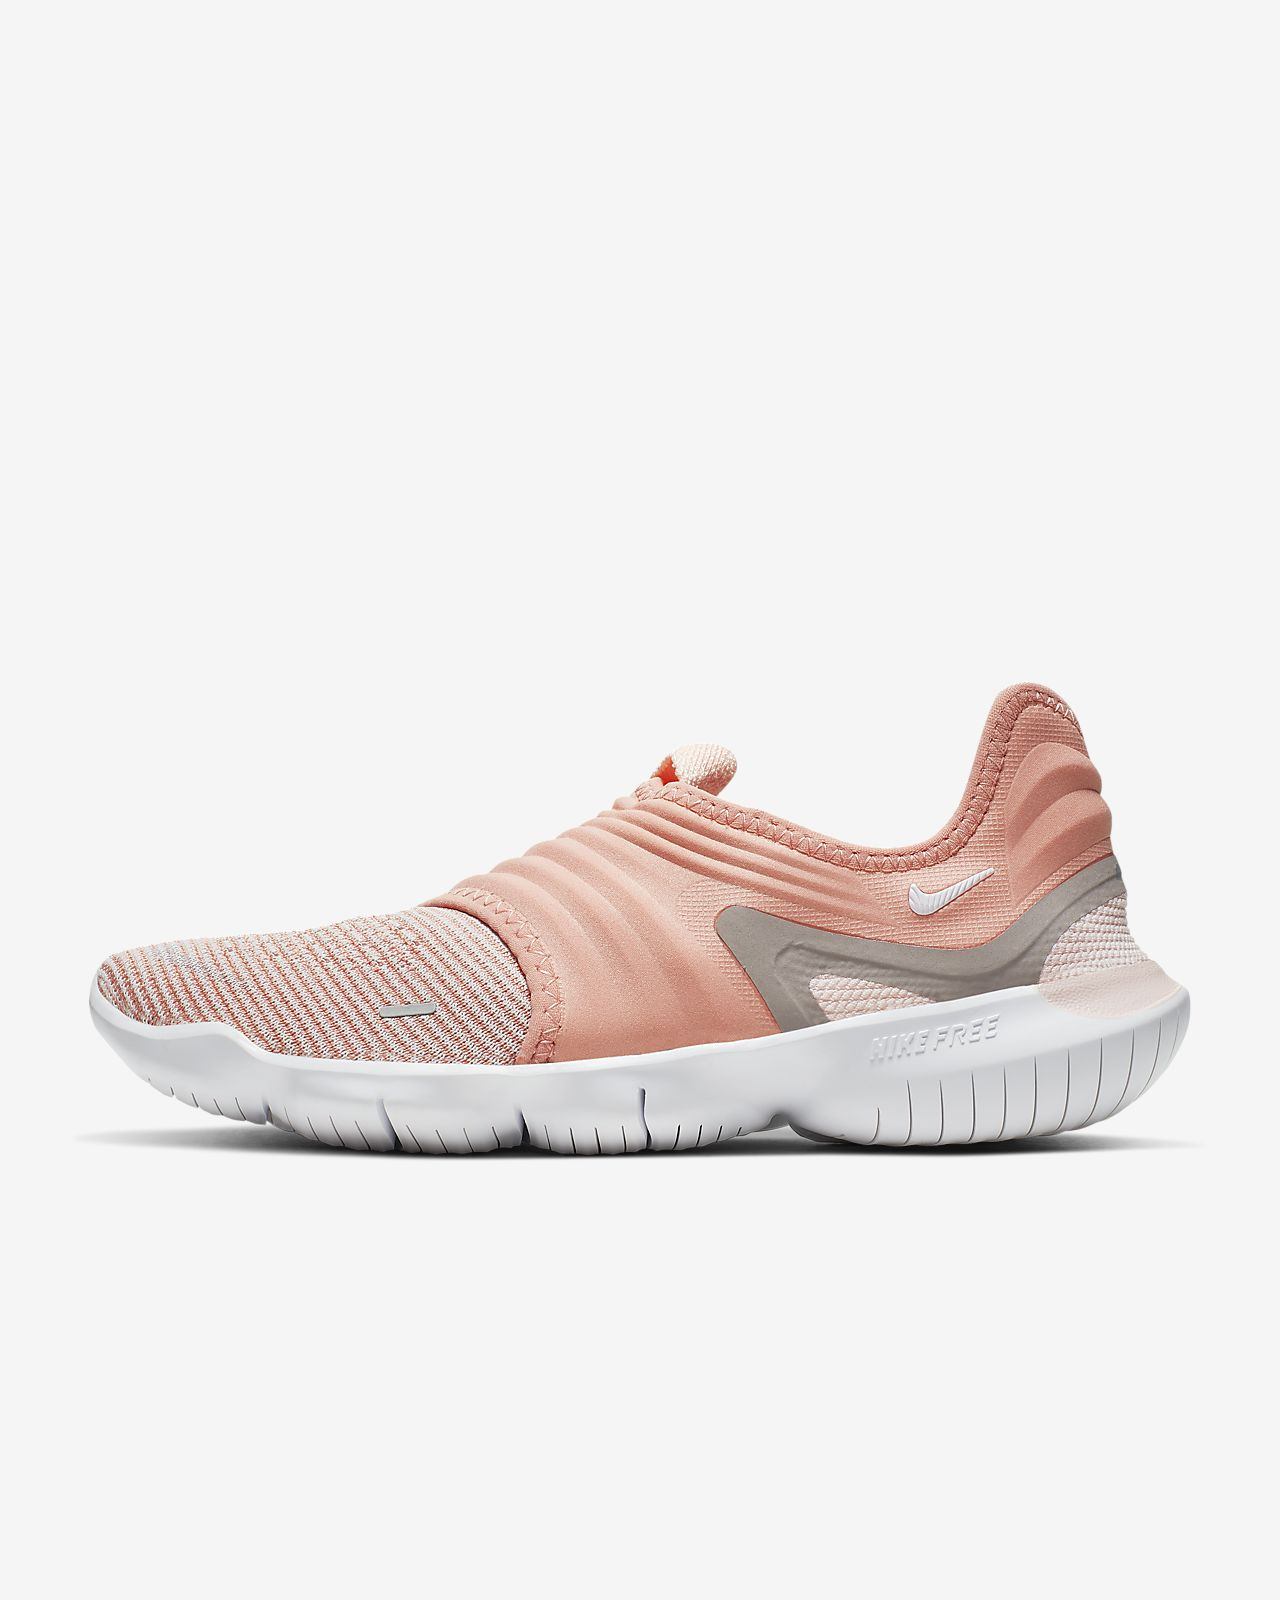 nike free 3.0 Nike Free RN Flyknit 3.0 Women's Running Shoe. Nike PT